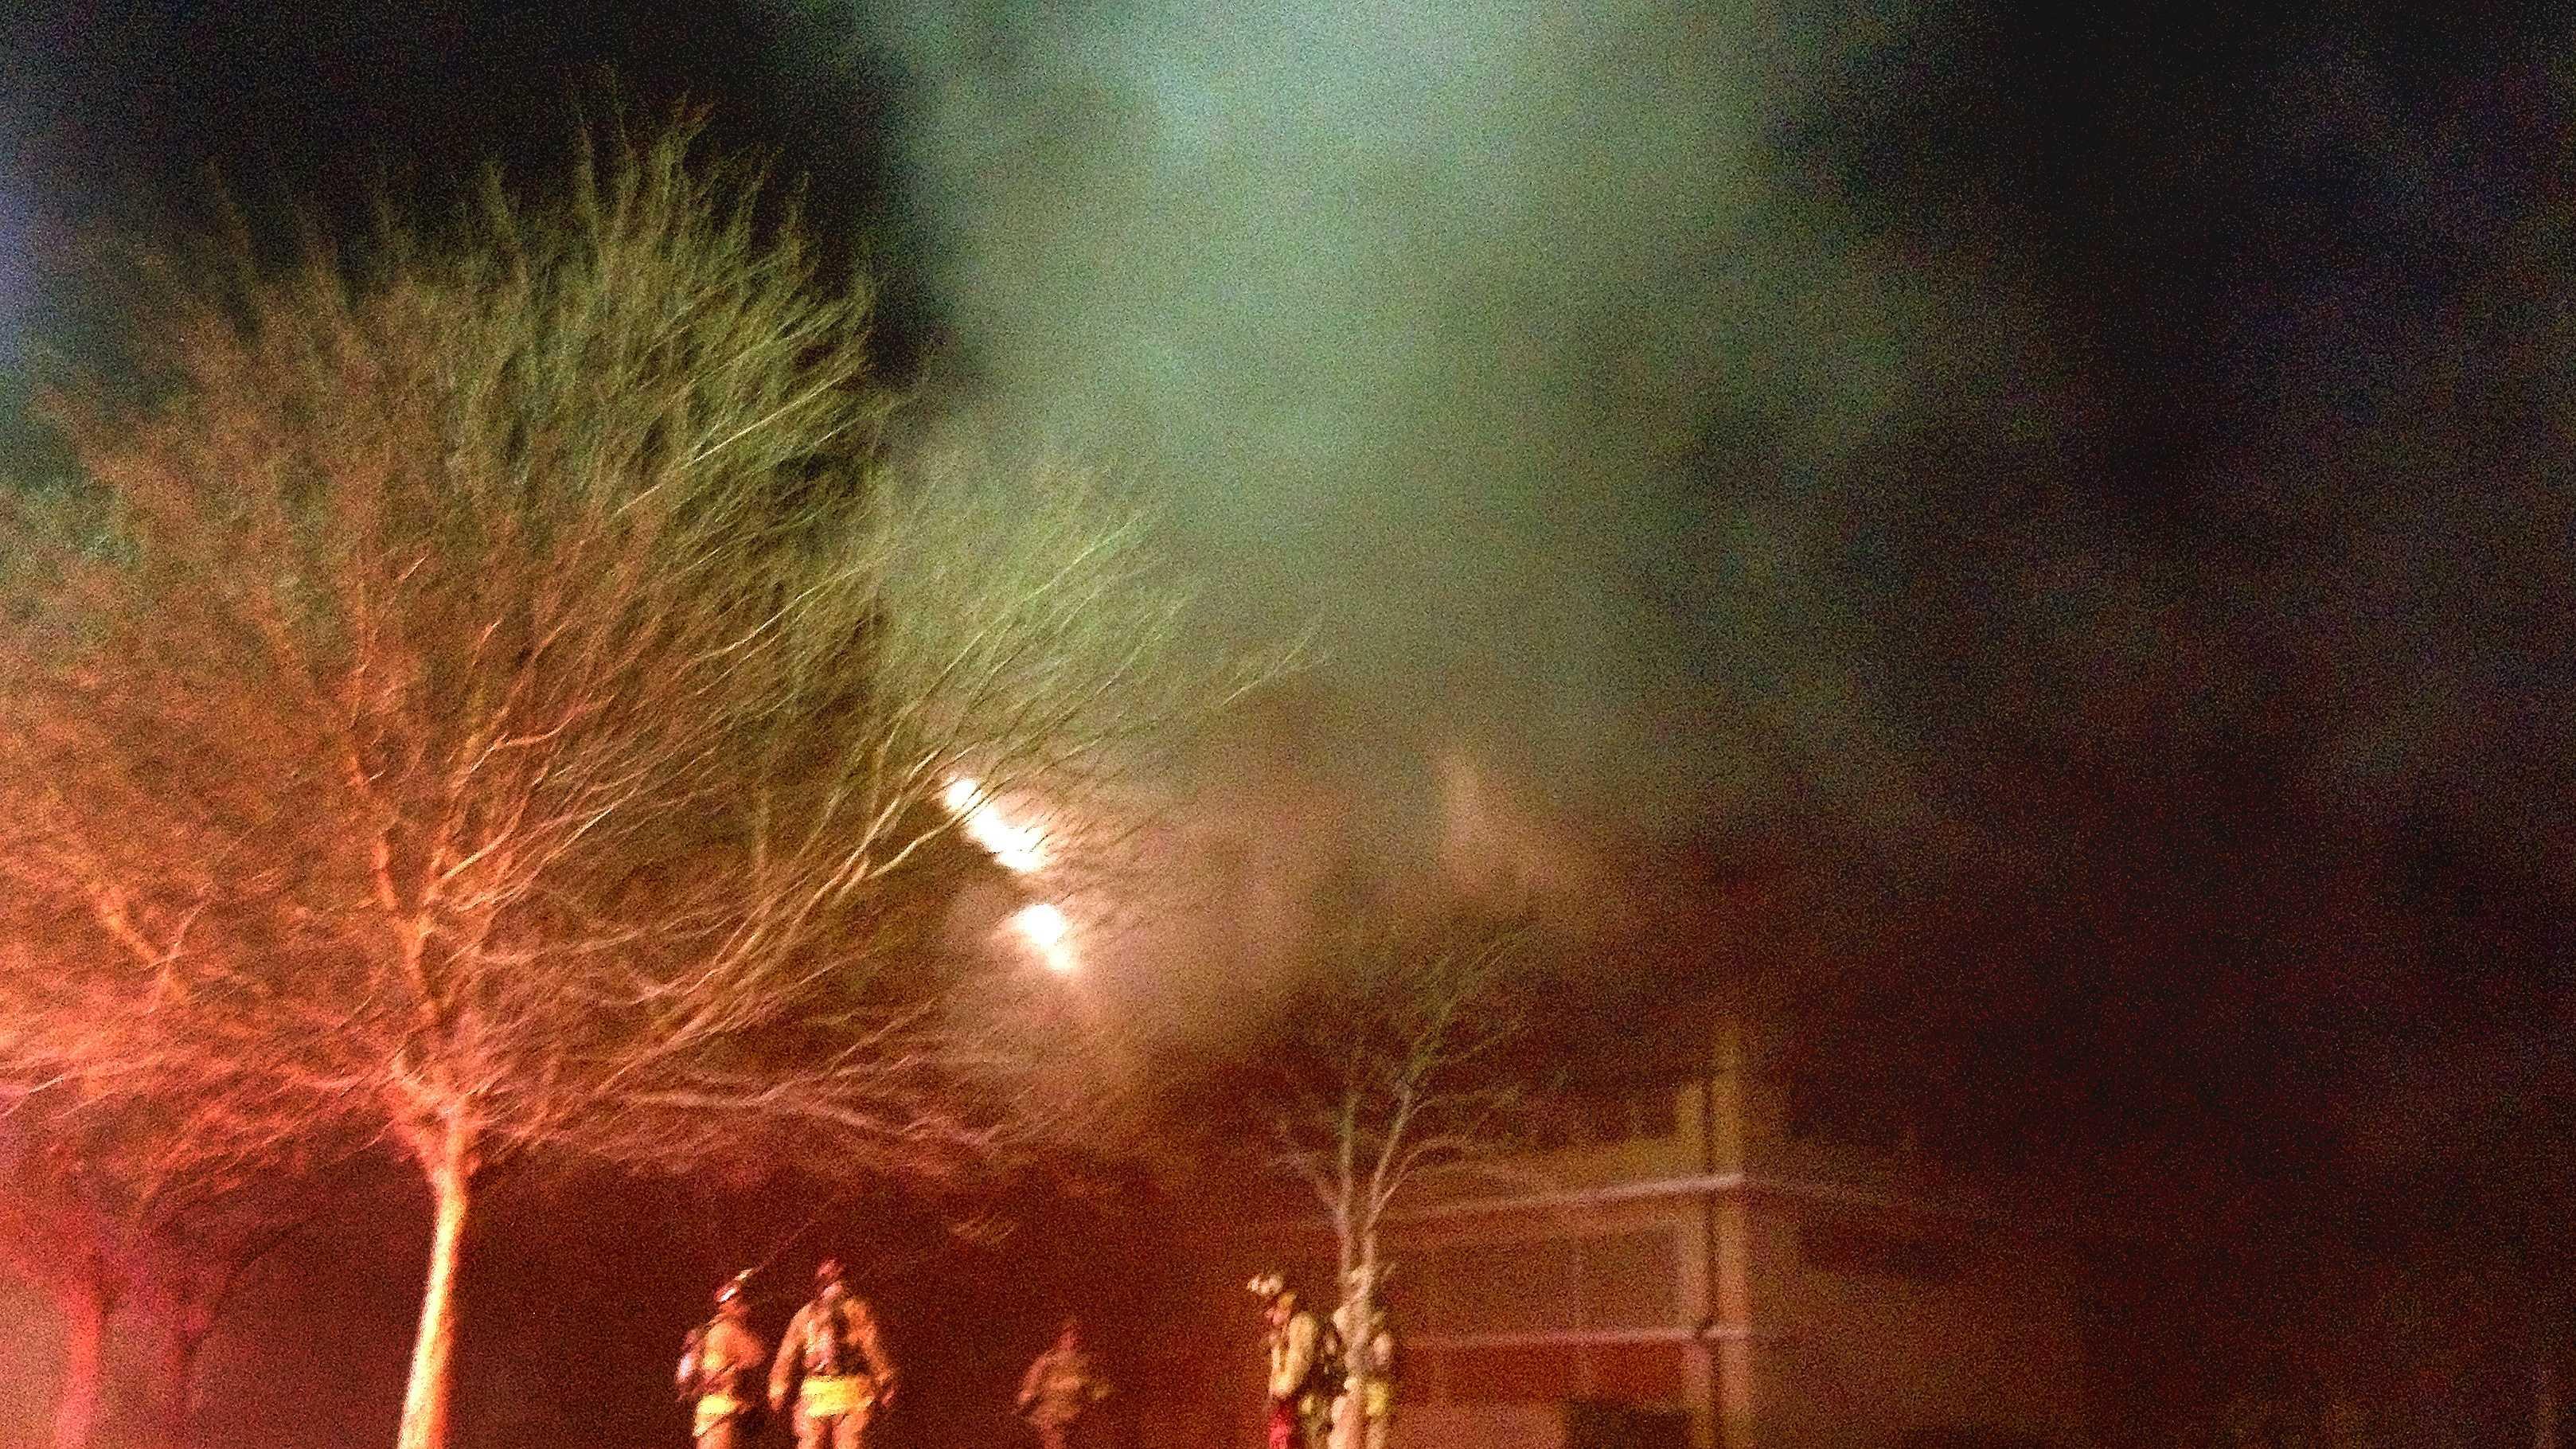 John Marshall High School fire